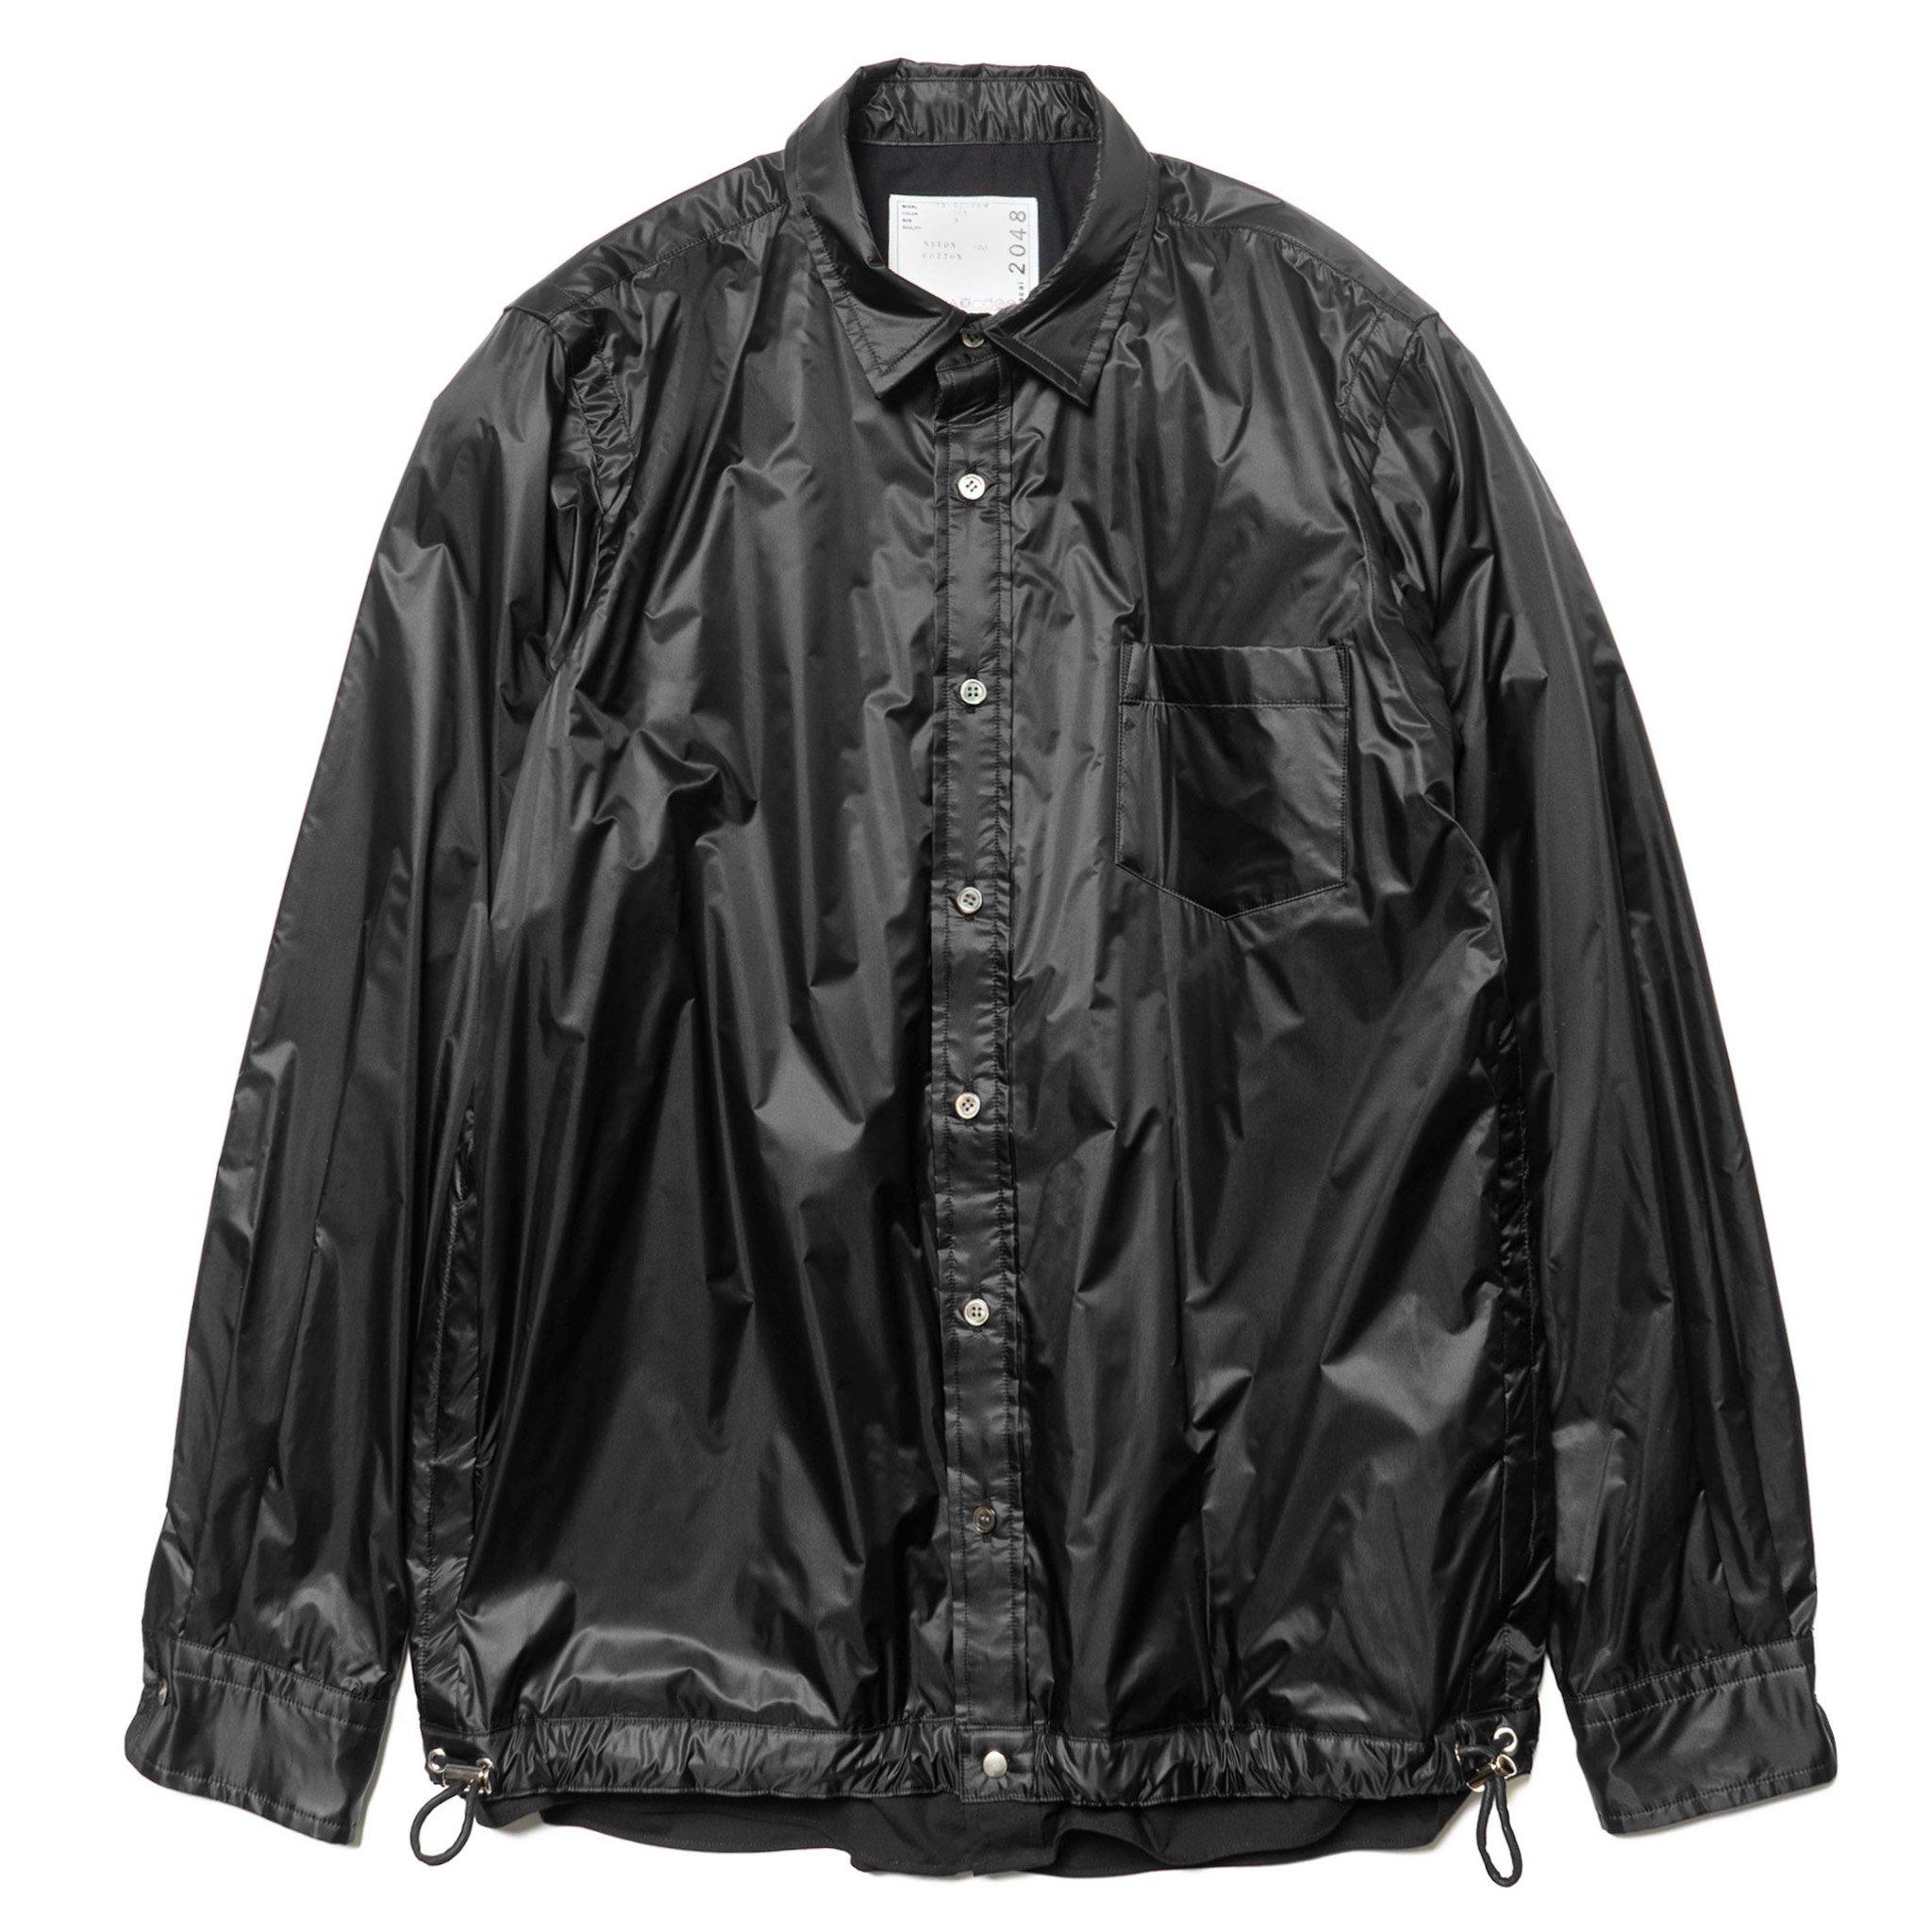 HAVEN-Sacai-Nylon-Shirt-BLACK-1_2048x2048.progressive.jpg